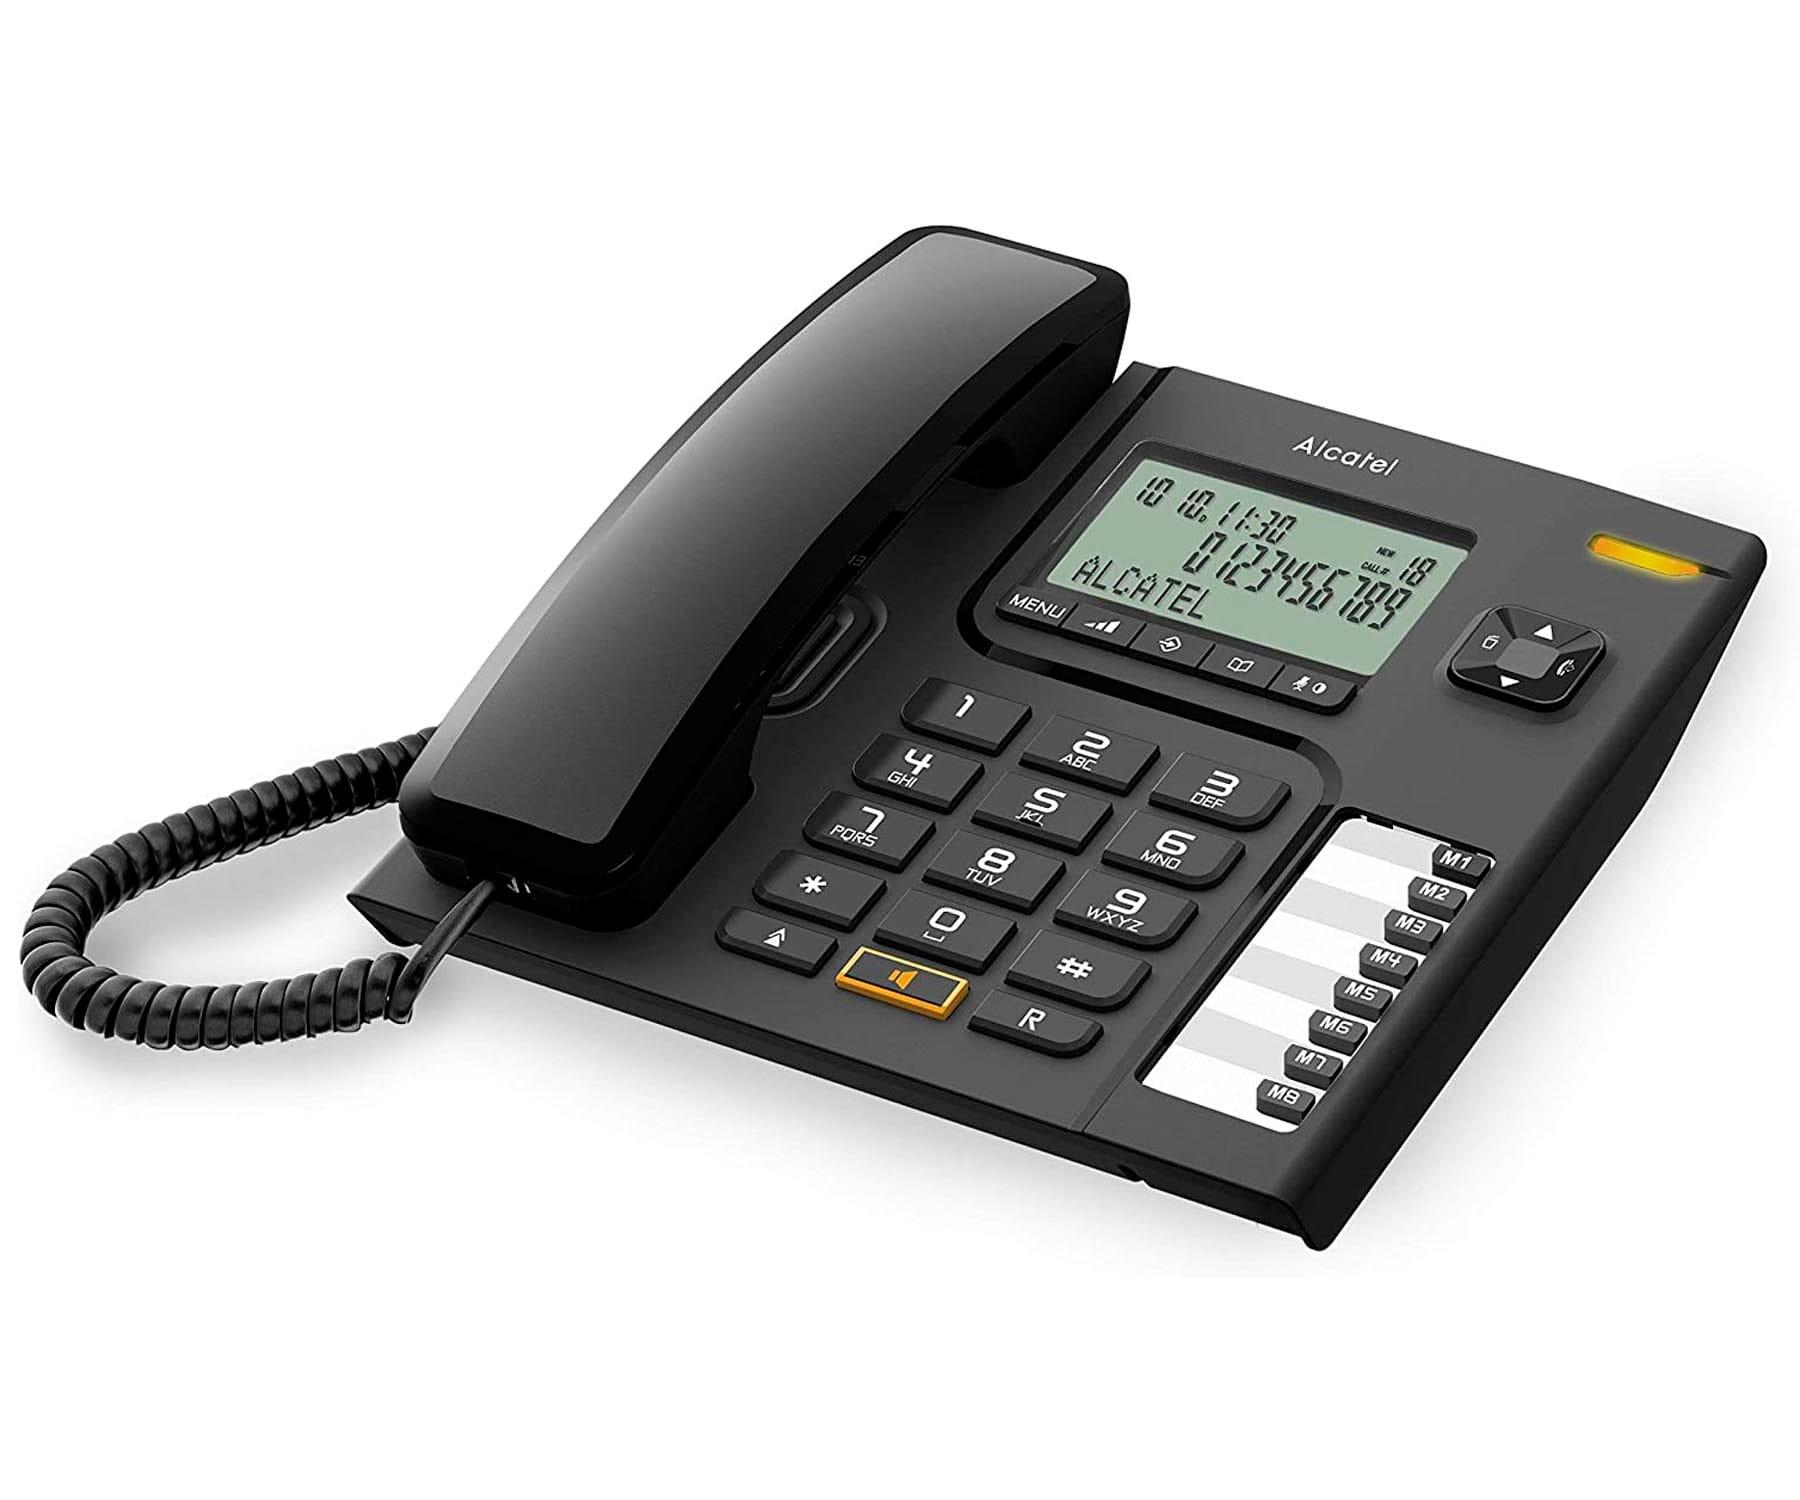 ALCATEL T76 NEGRO TELÉFONO FIJO CON CABLE PANTALLA MANOS LIBRES